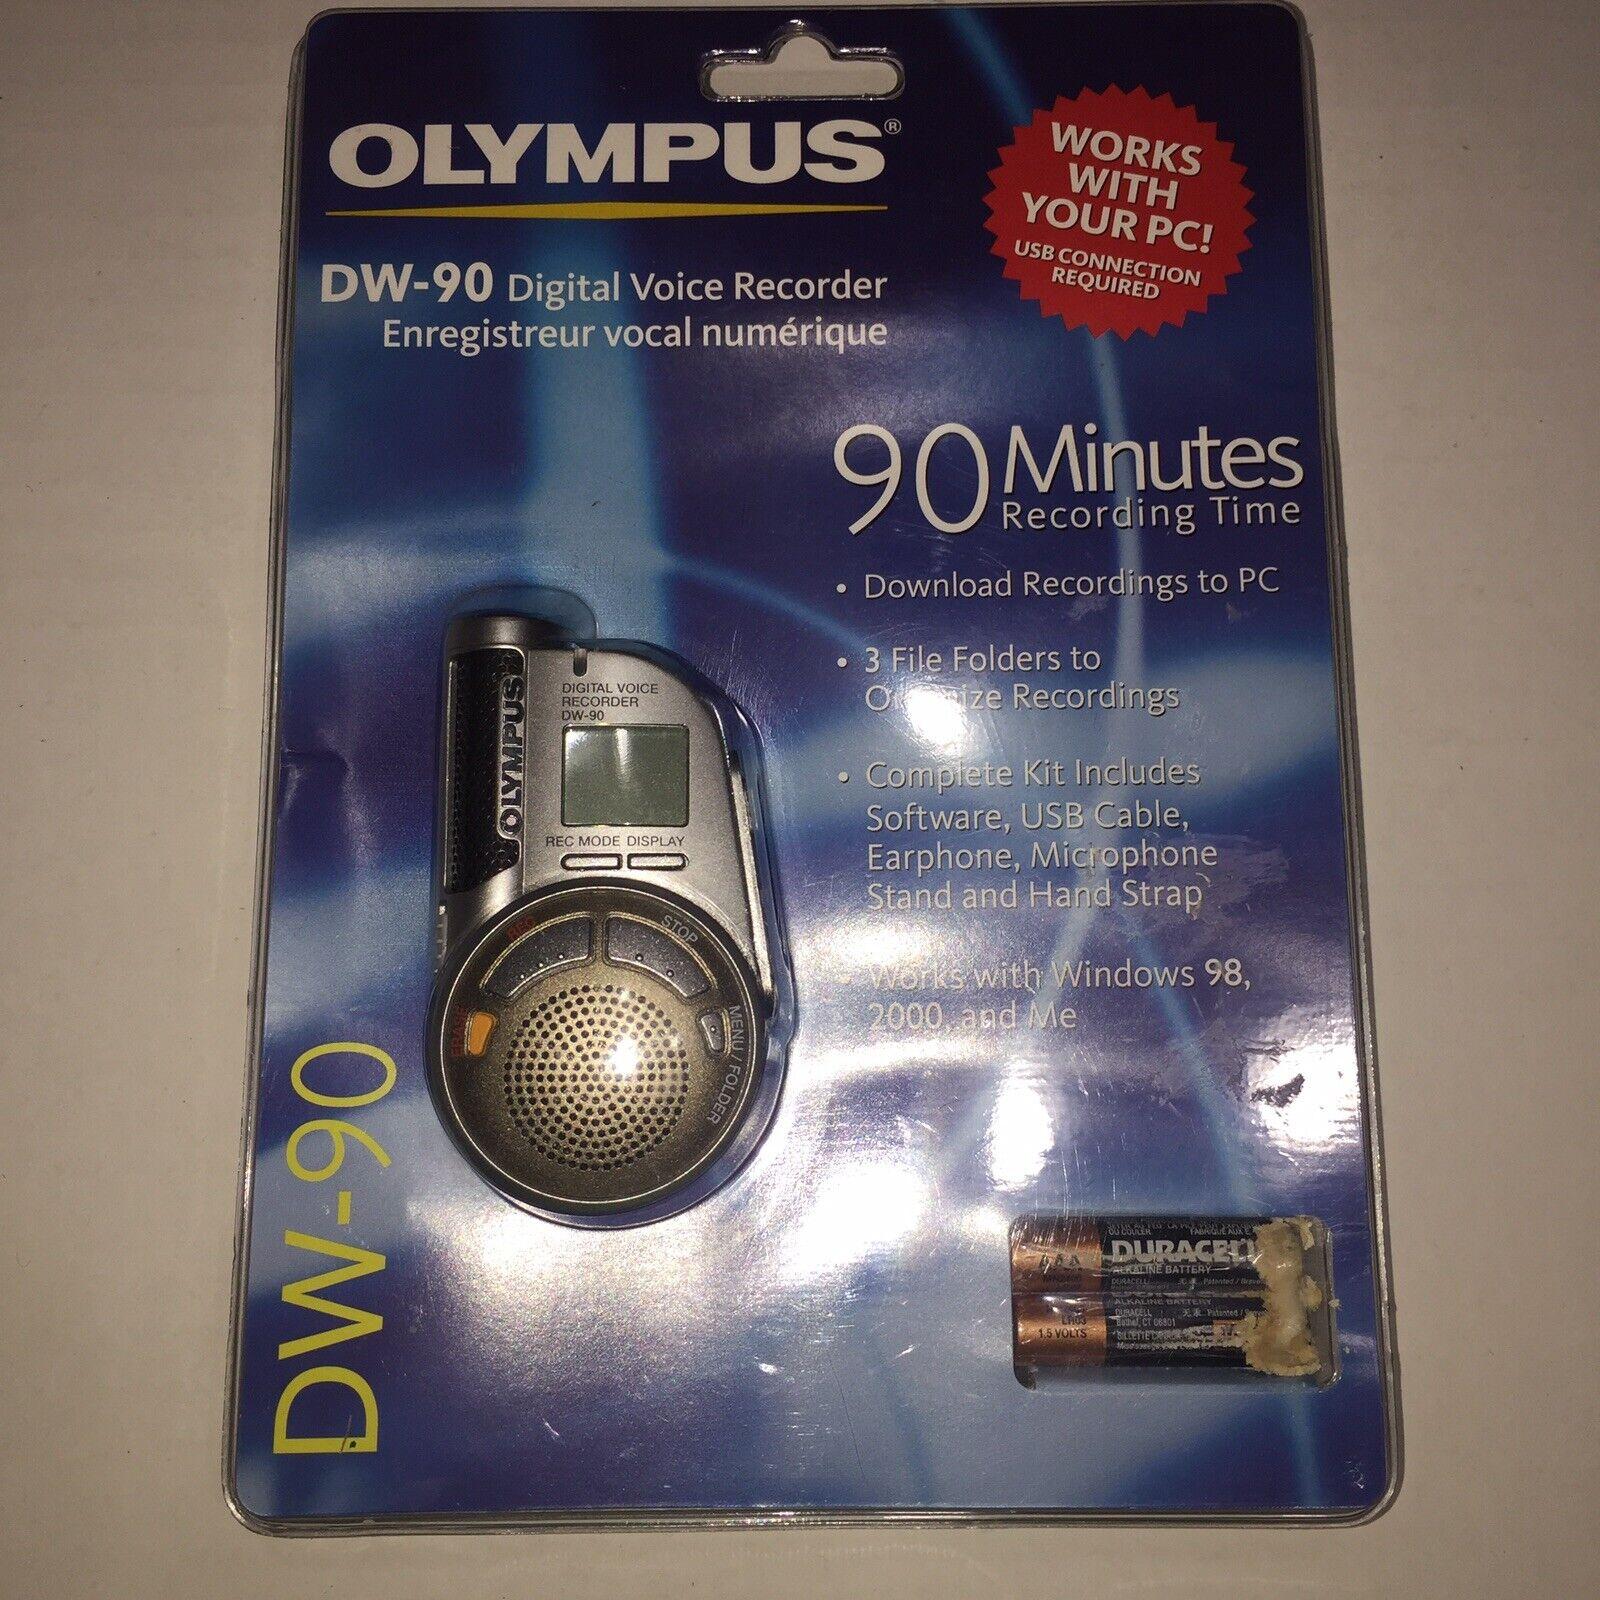 OLYMPUS DIGITAL VOICE RECORDER DW-90 WINDOWS VISTA DRIVER DOWNLOAD